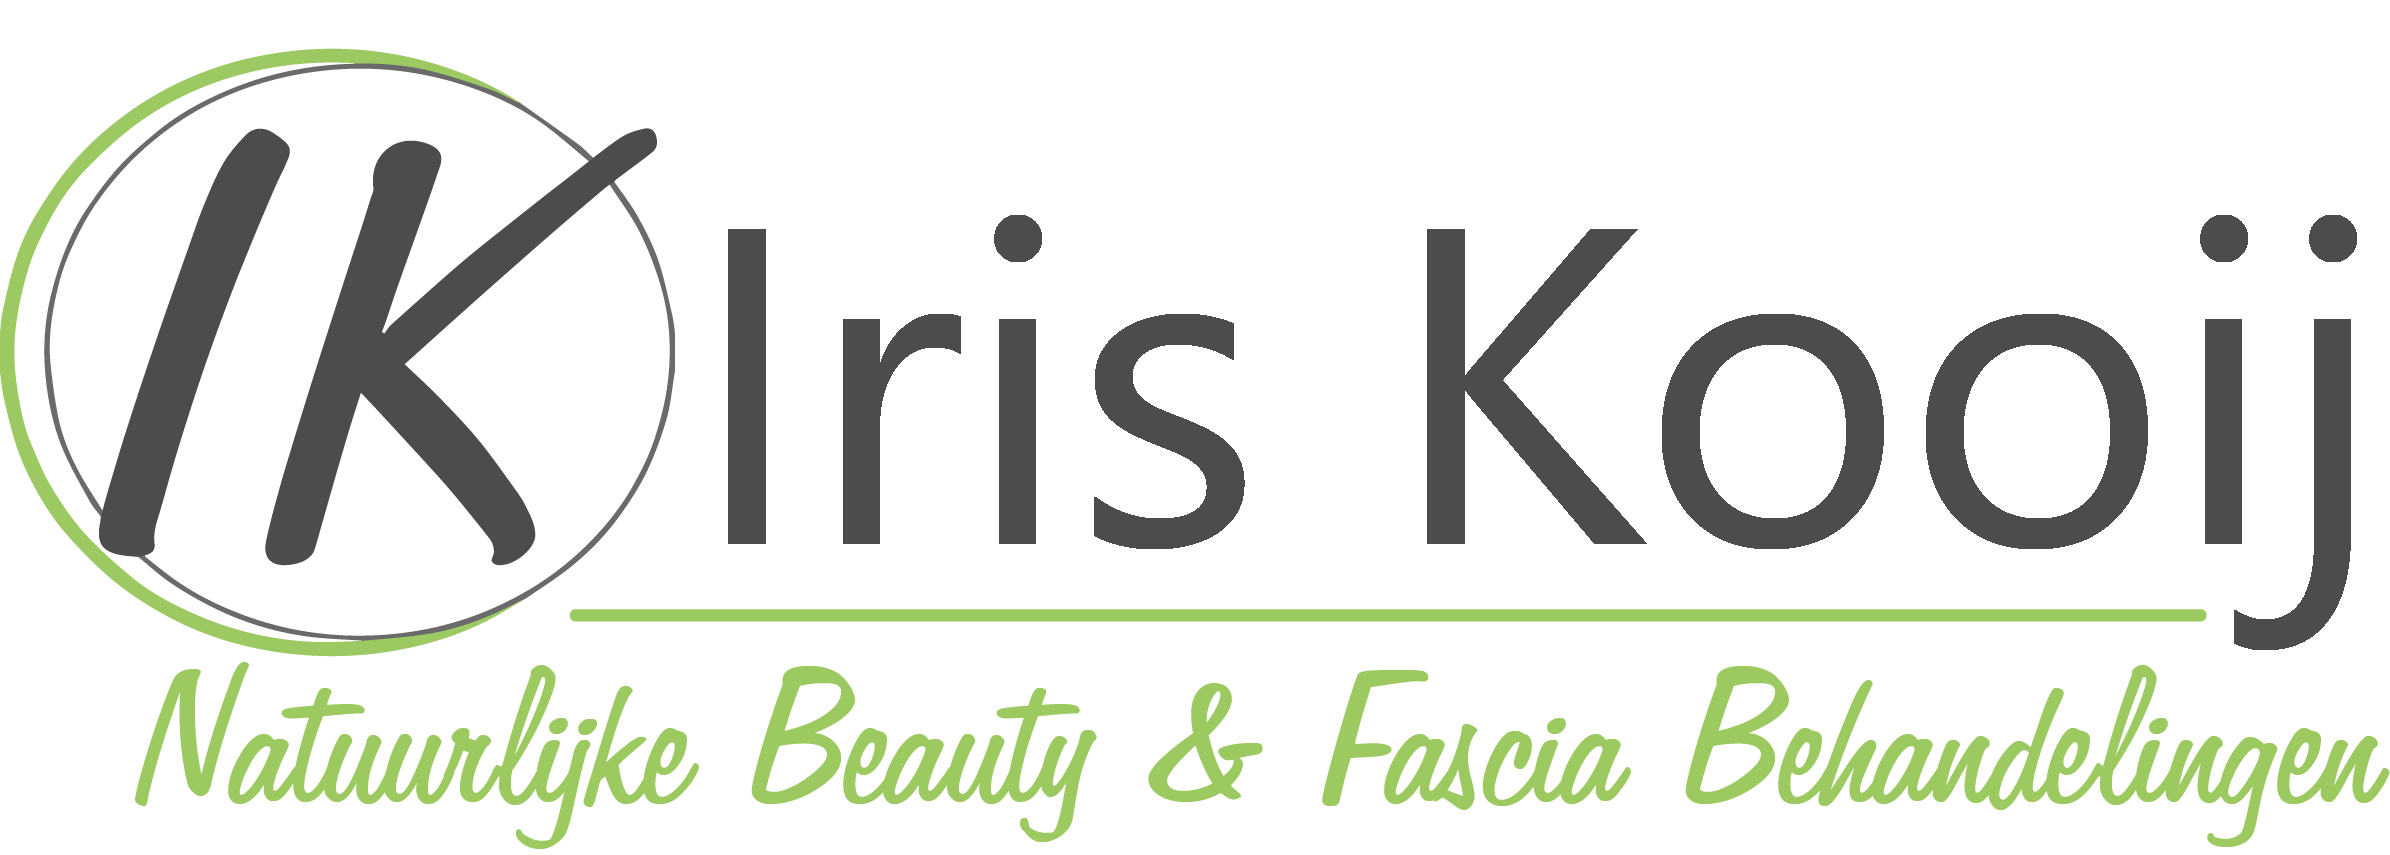 Iris Kooij Wellness Logo